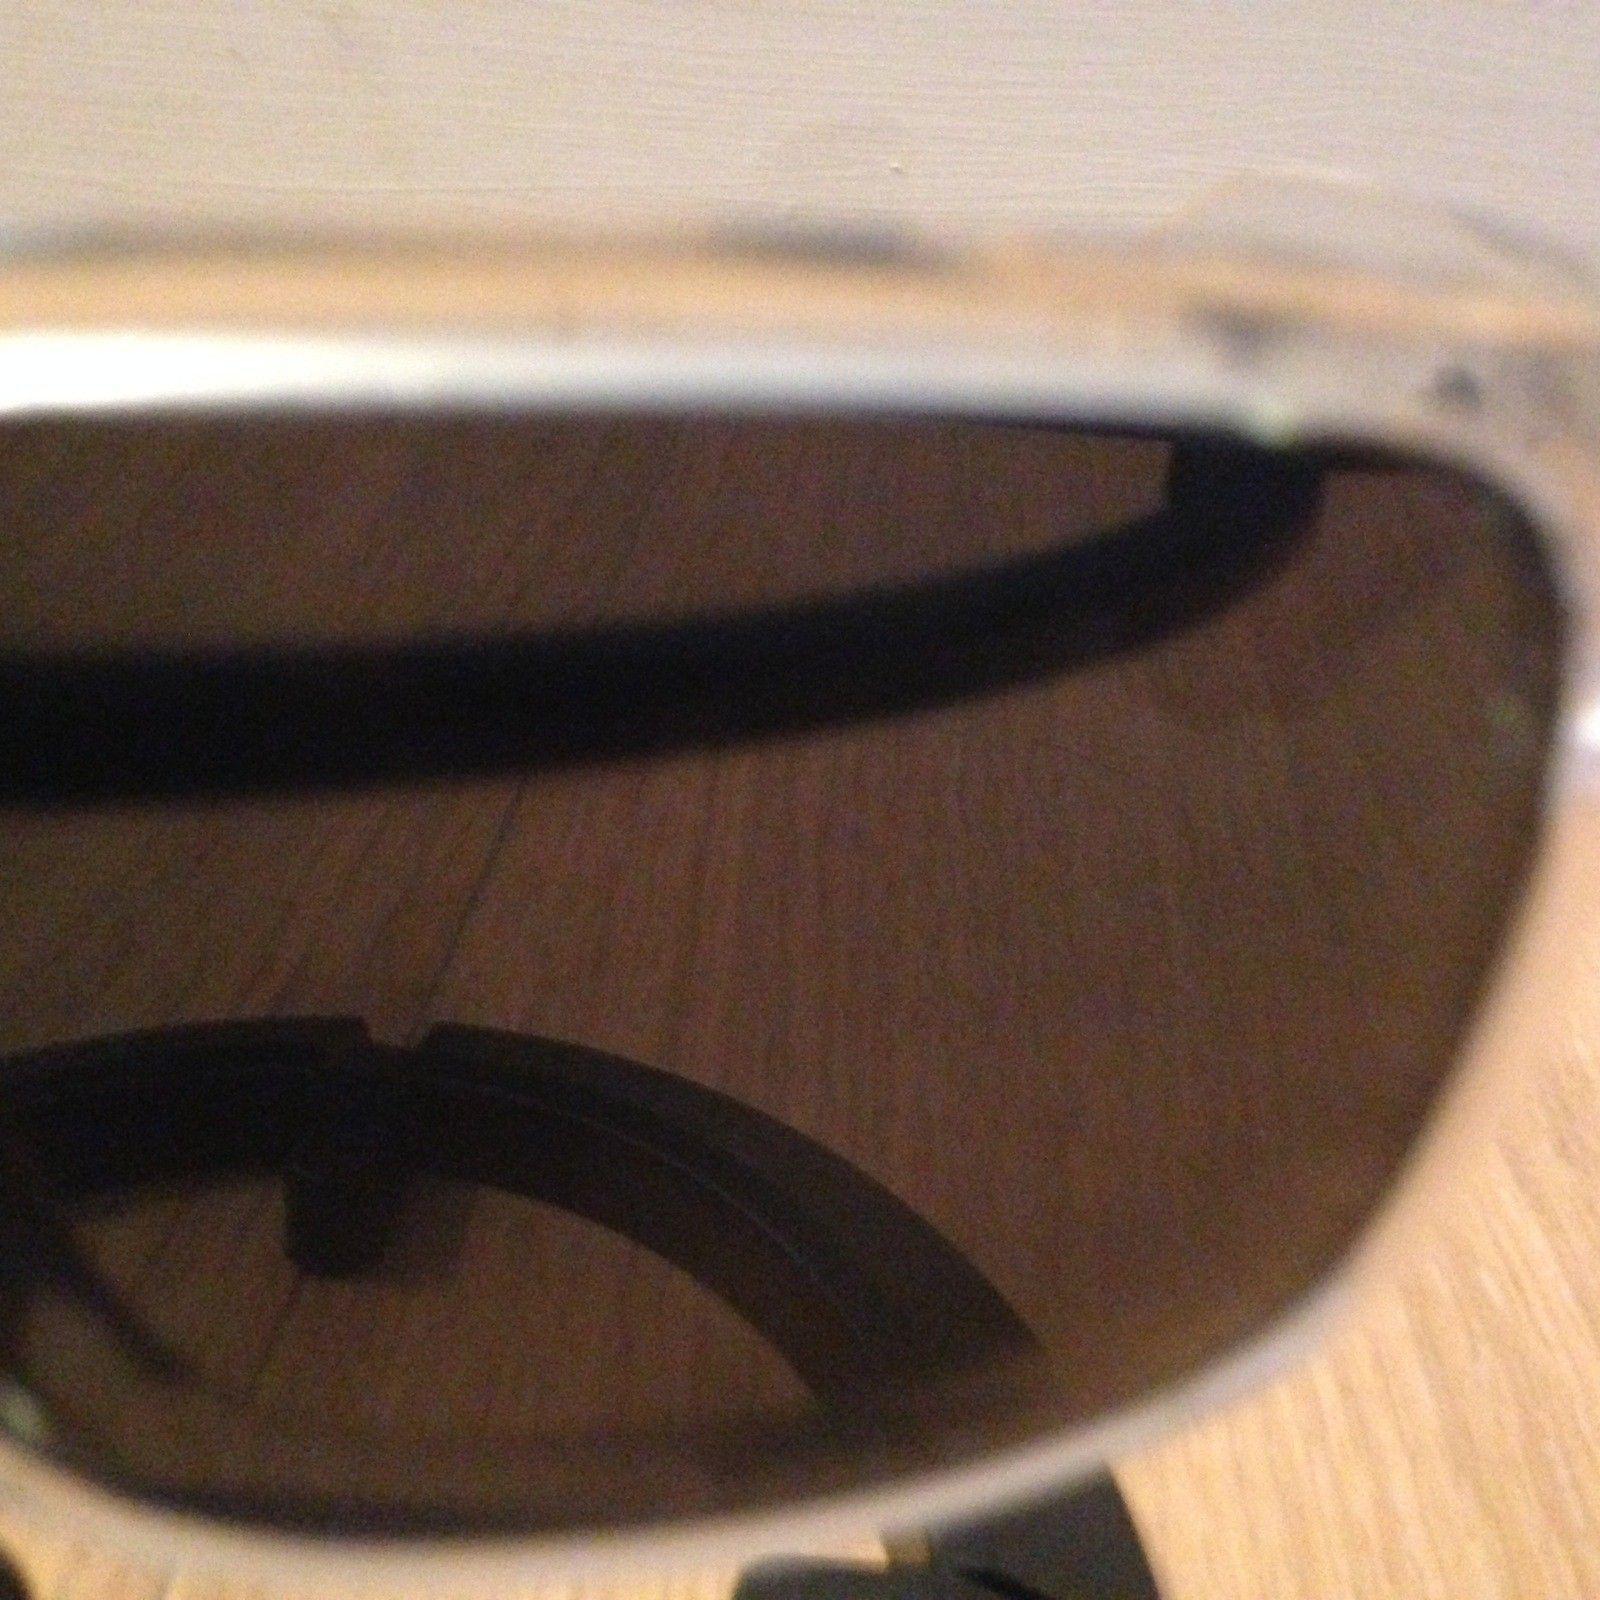 Revant Optics HC3 Elite Holbrook Lens Review - Revant_Elite_Holbrook_Clear_Frame.JPG